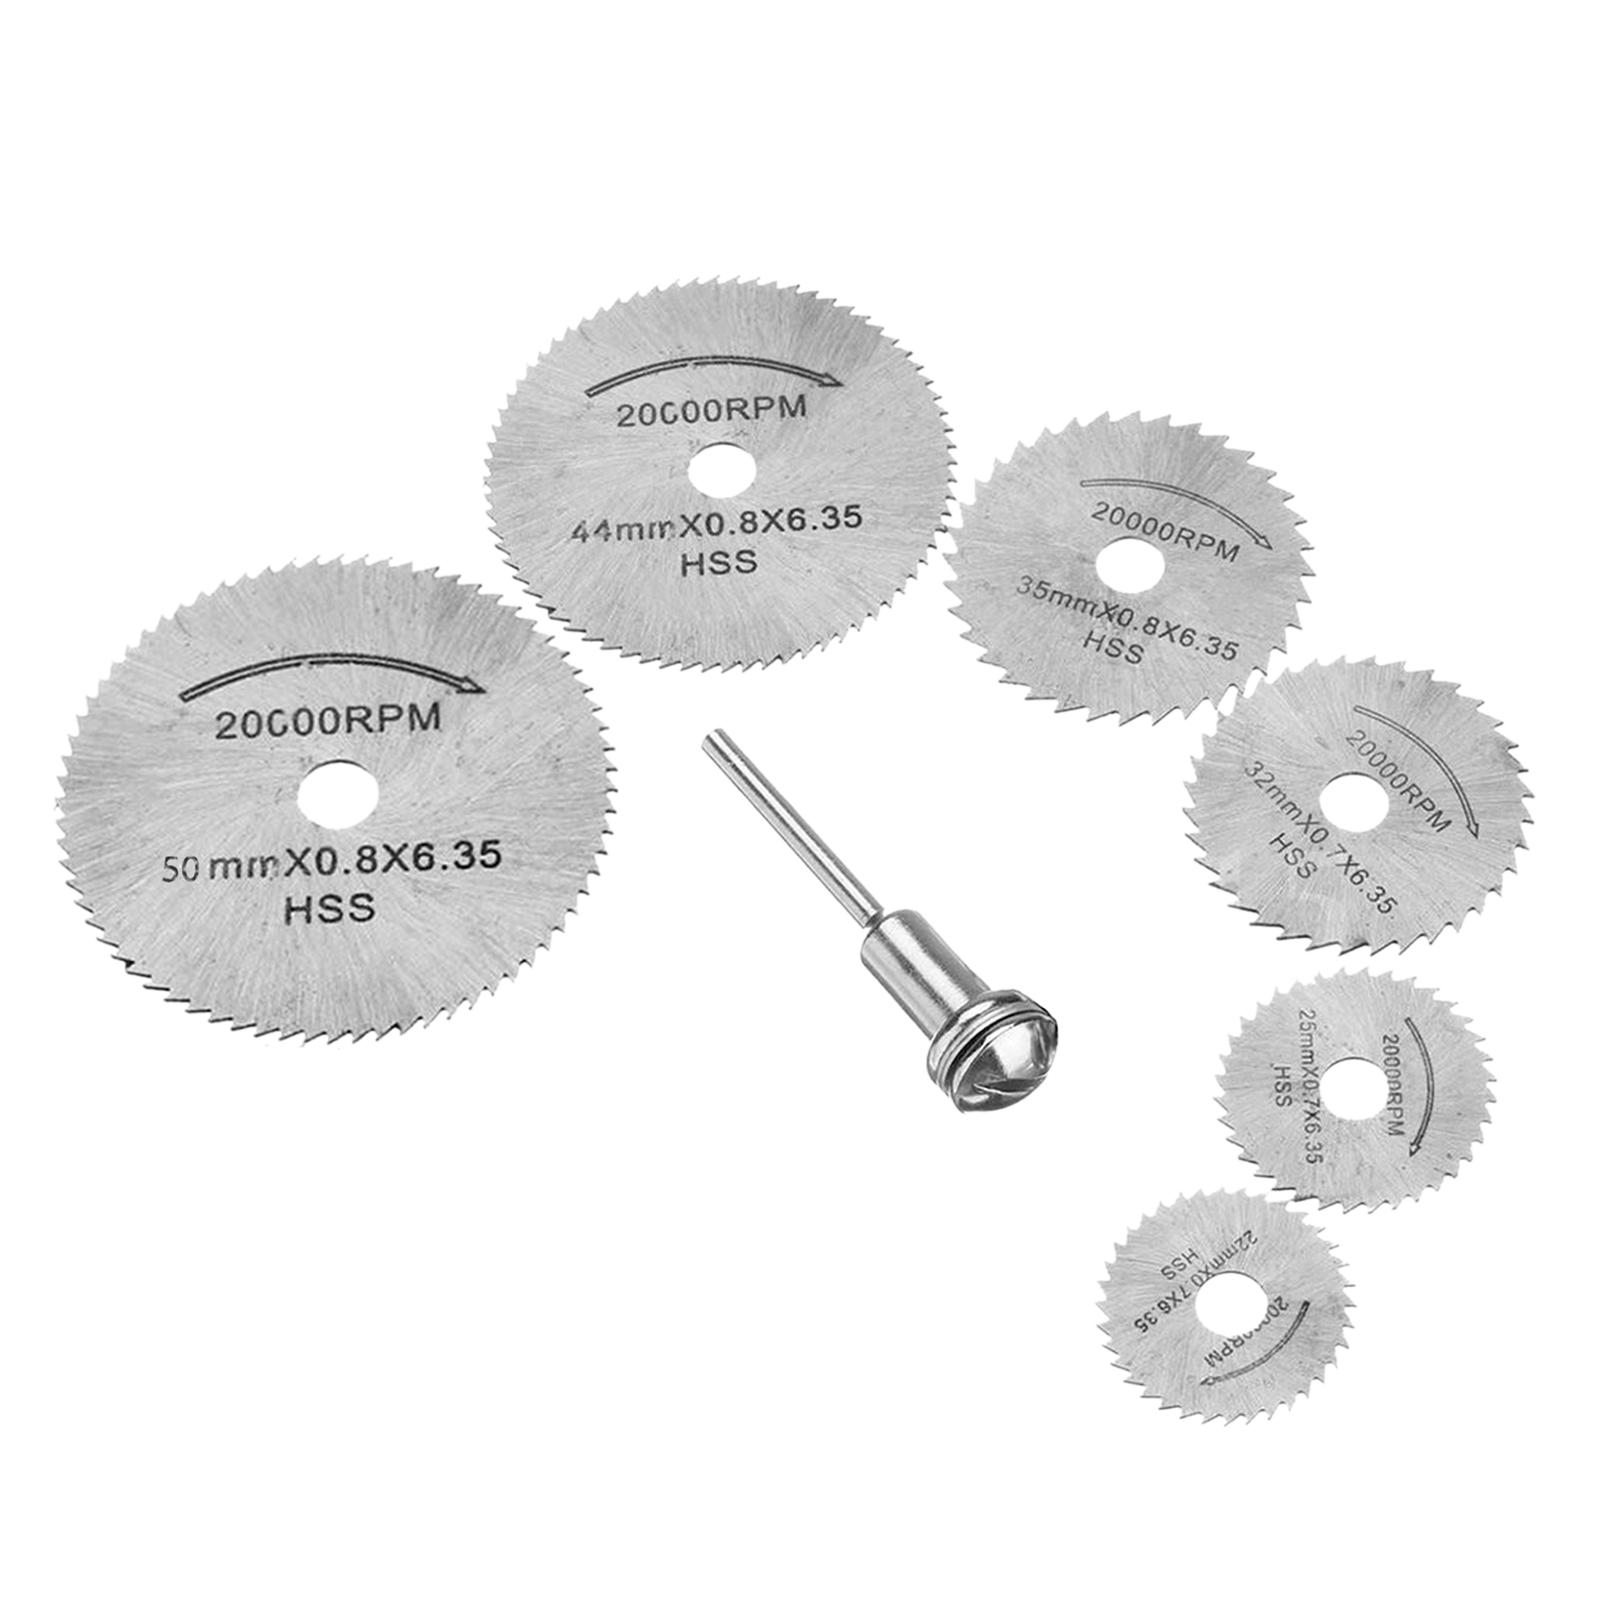 7 pcs Mini Diamond Rotary Cutting Off Saw Blade Wheel Disc Kit Tool 3.2mm Arbors